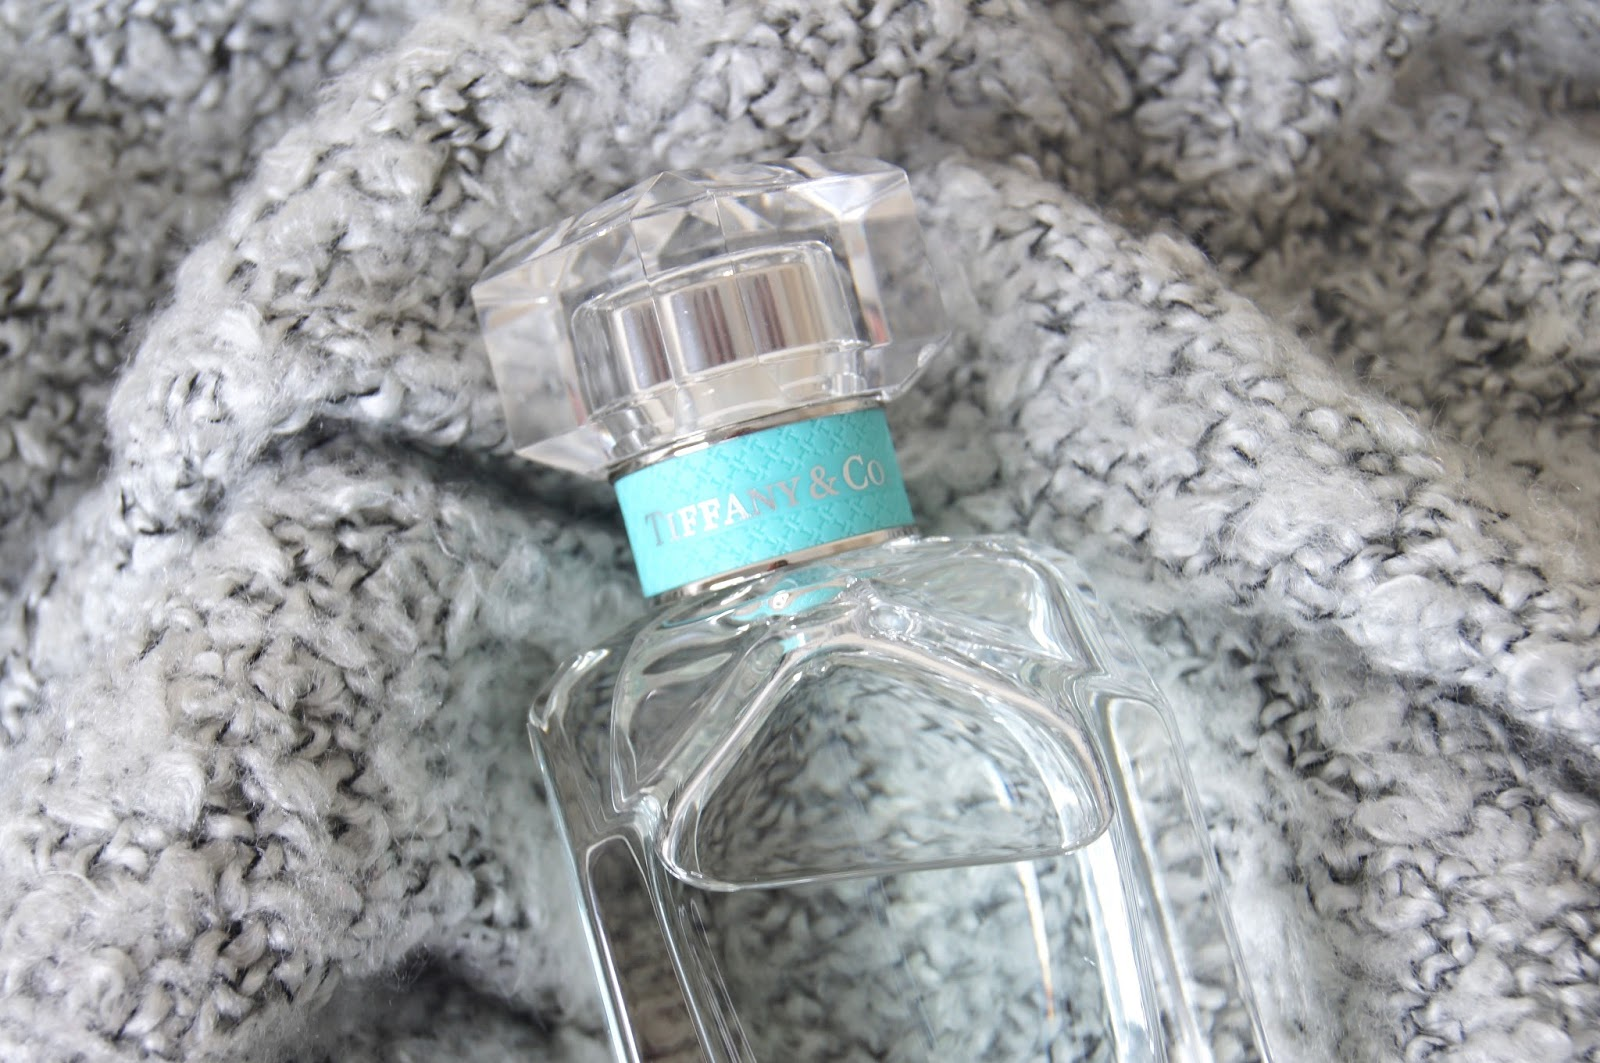 tiffany & co eau de parfum review fragrance scent floral feminine fresh iris musk vert de mandarine